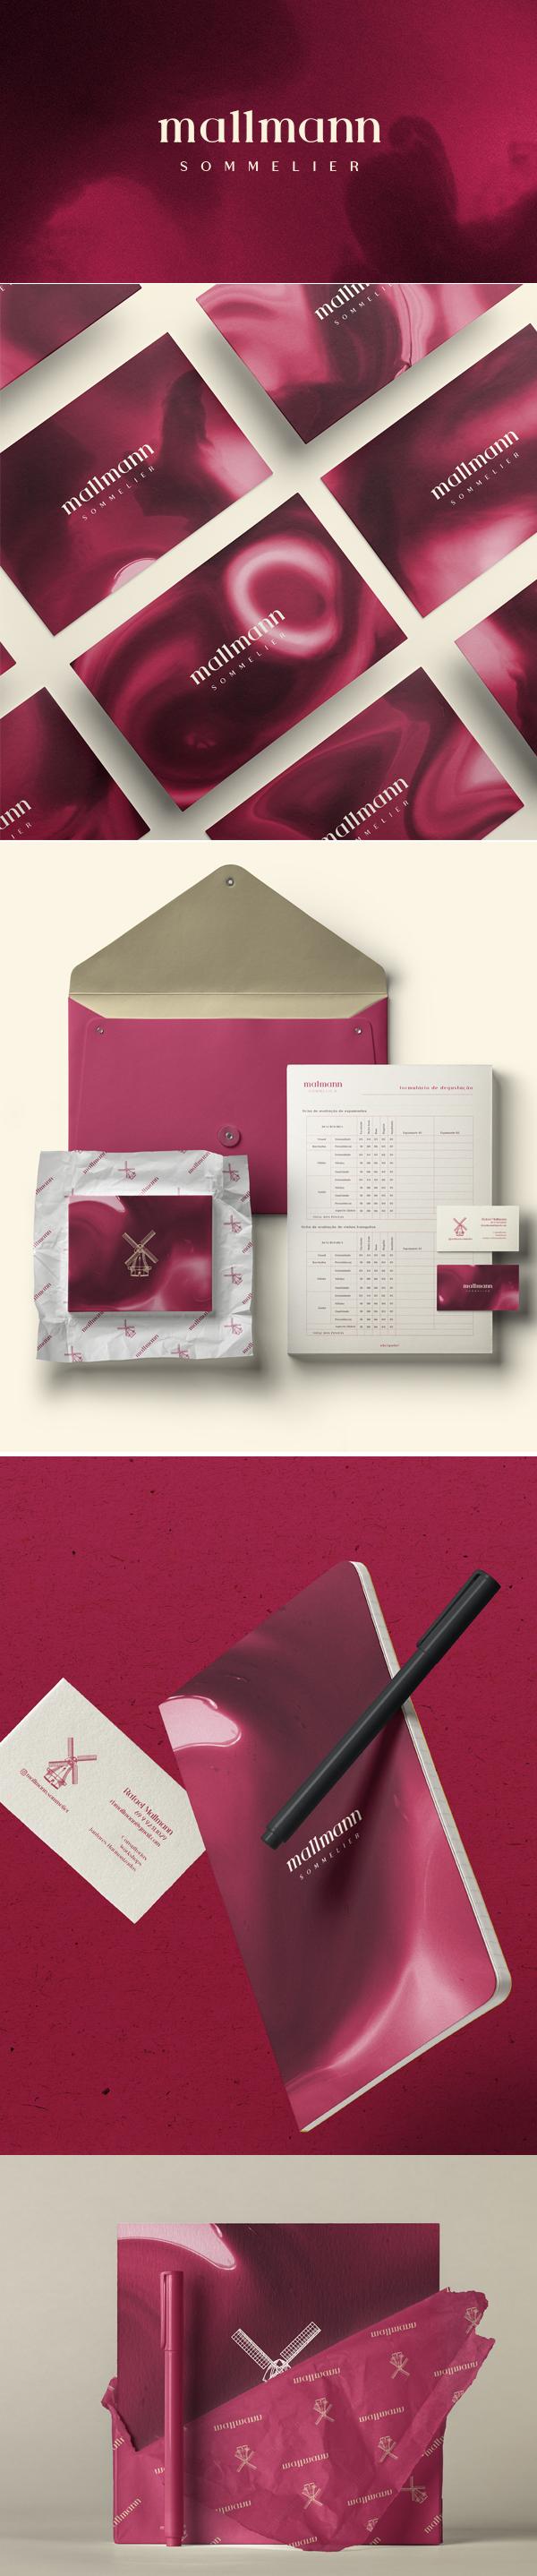 Mallmann Sommelier Branding by Dalini Arte